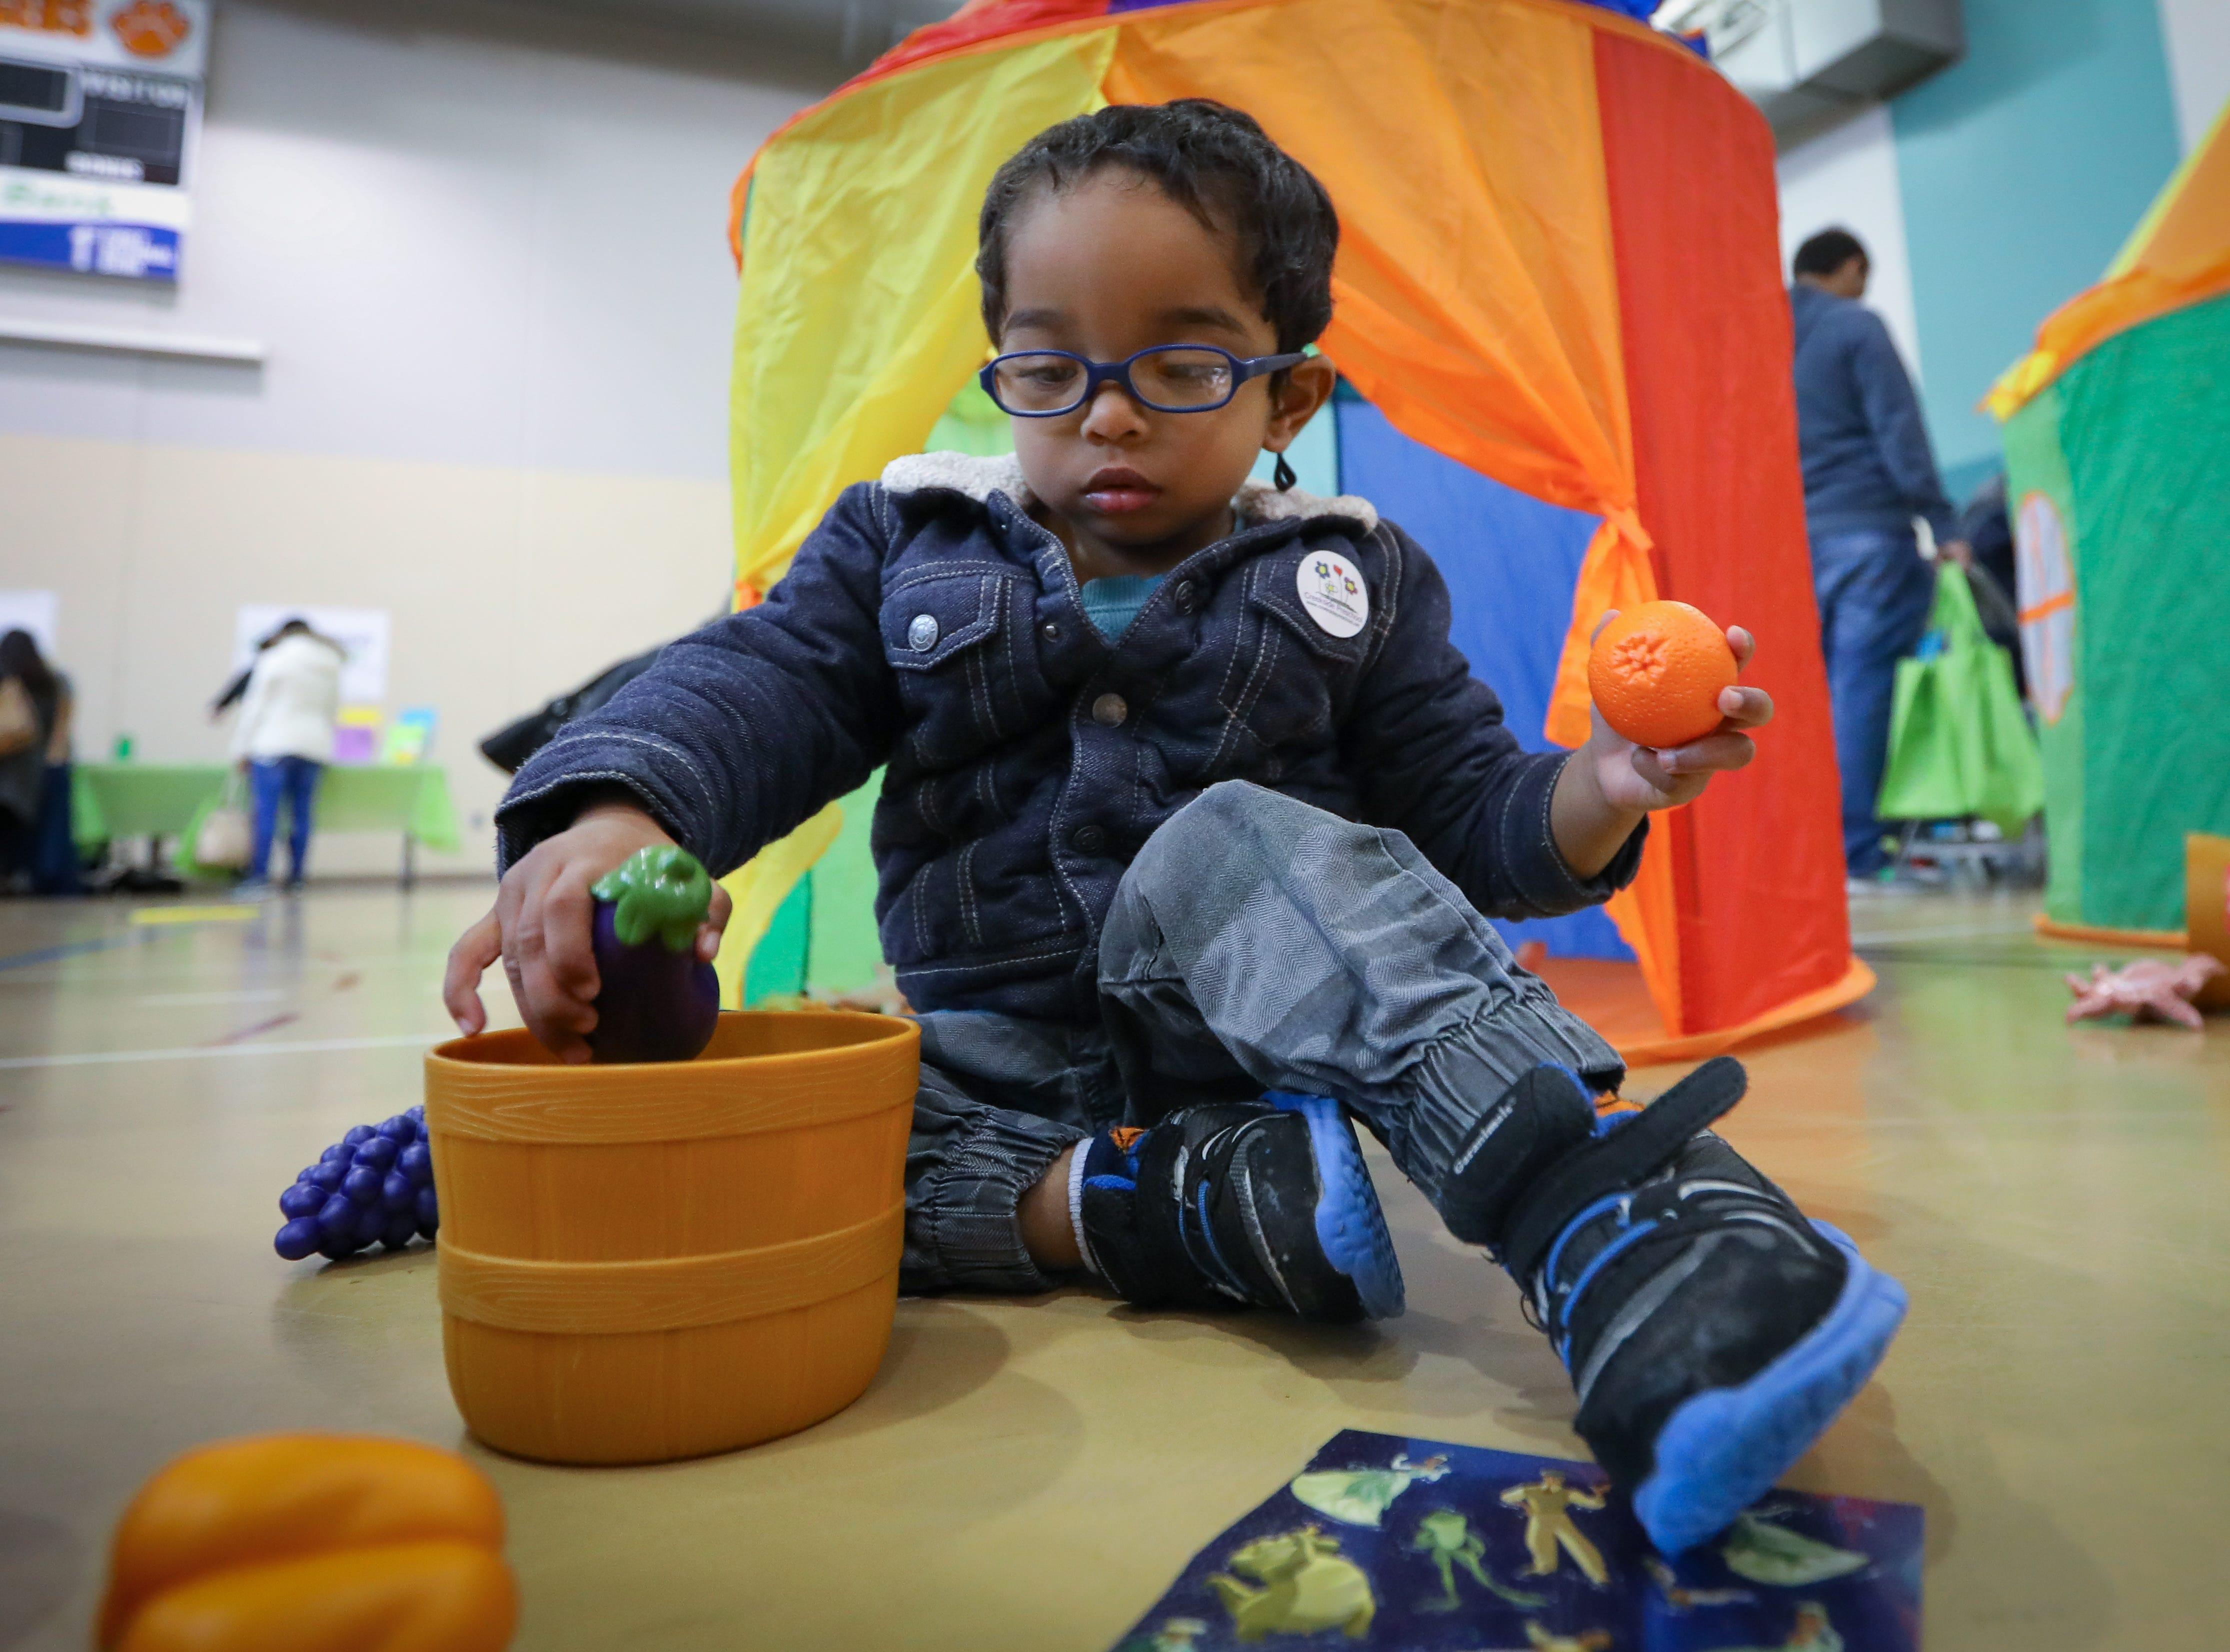 Gavin, 2 of Des Moines participates in the Preschool Palooza at Hillside Elementary School on Saturday, Nov. 3, 2018 in Des Moines, Iowa.